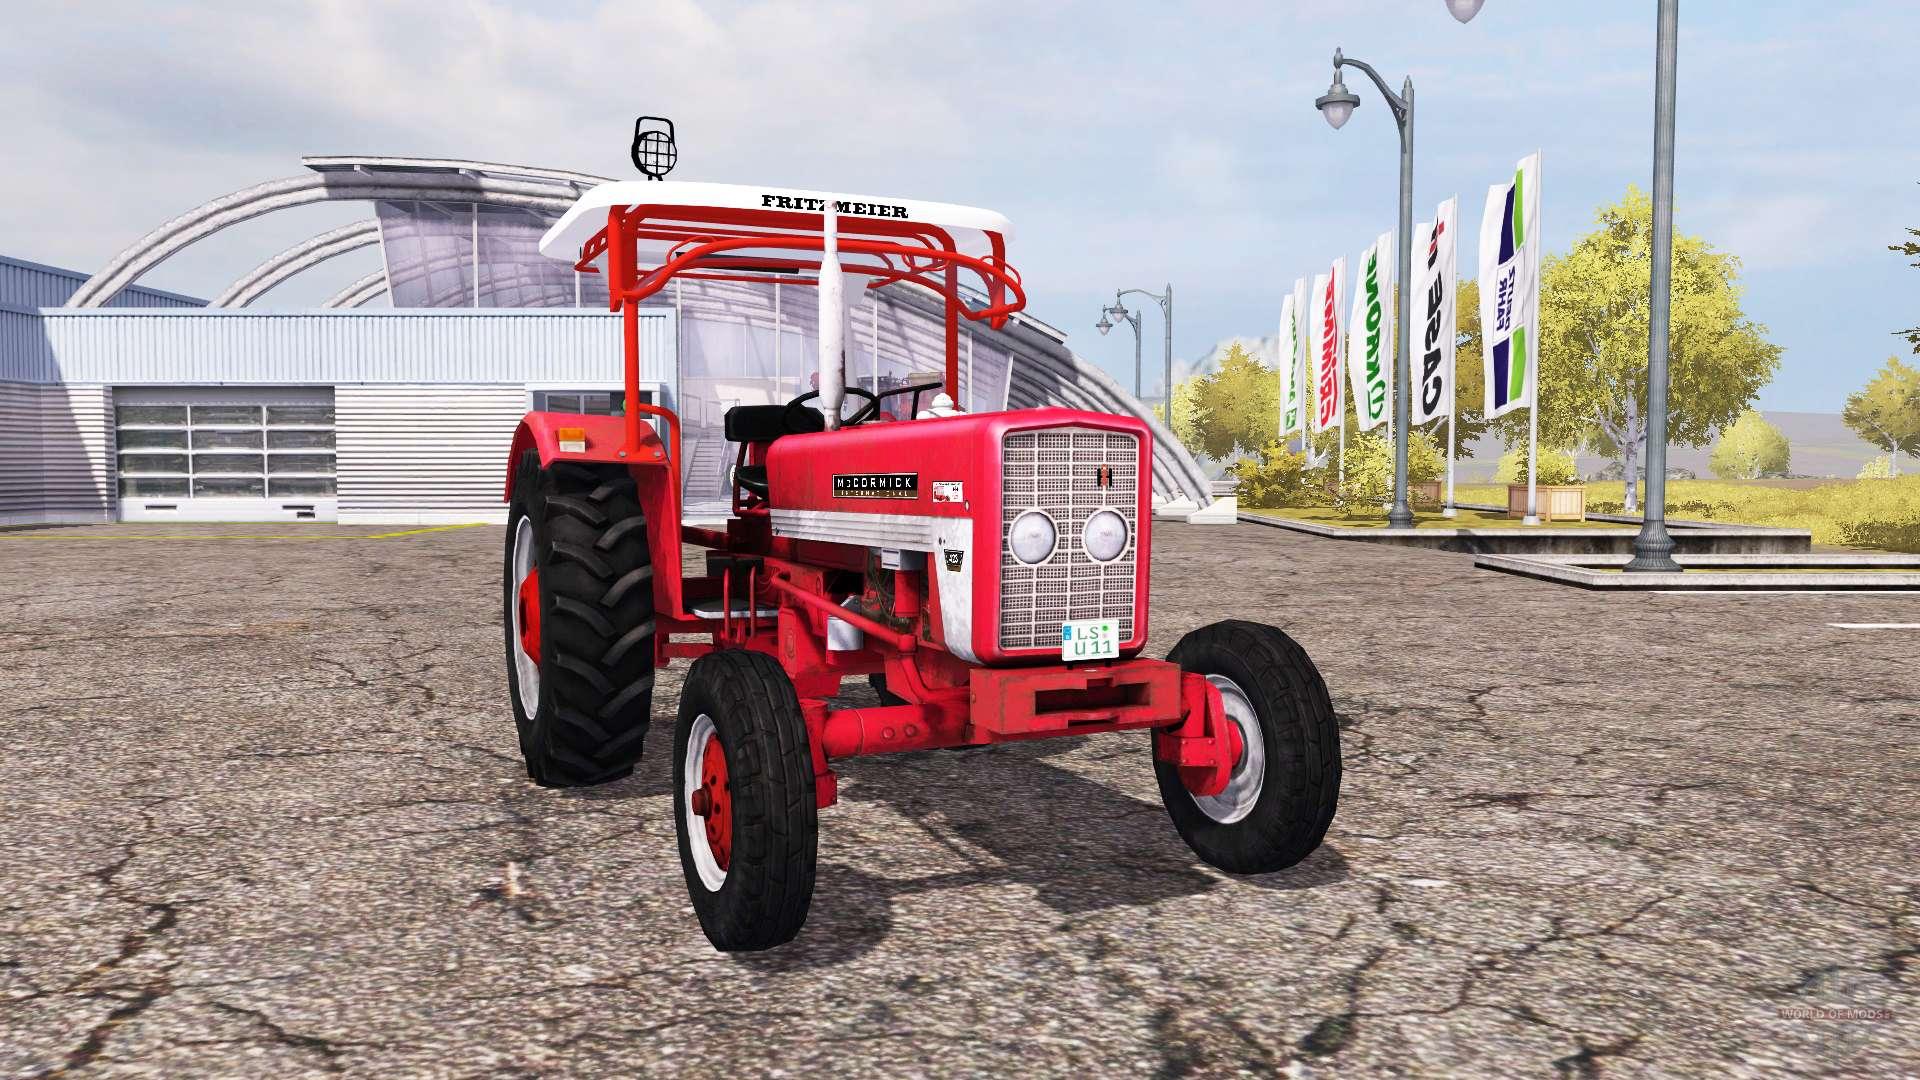 Mccormick mtx 135 for farming simulator 2013 mccormick international 423 publicscrutiny Gallery